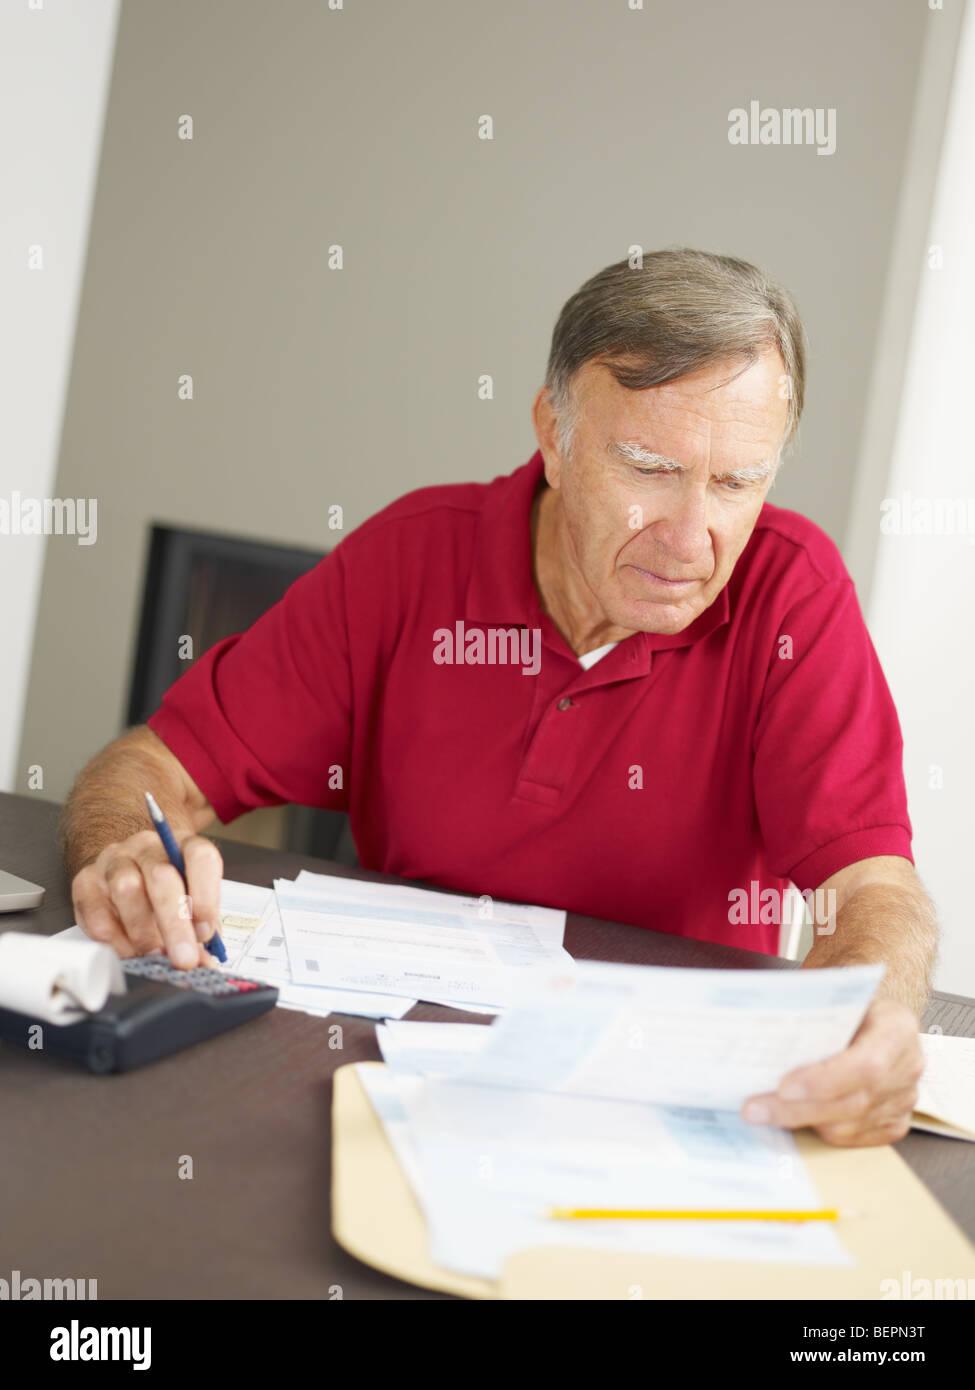 Senior man checking home finances. Copy space - Stock Image